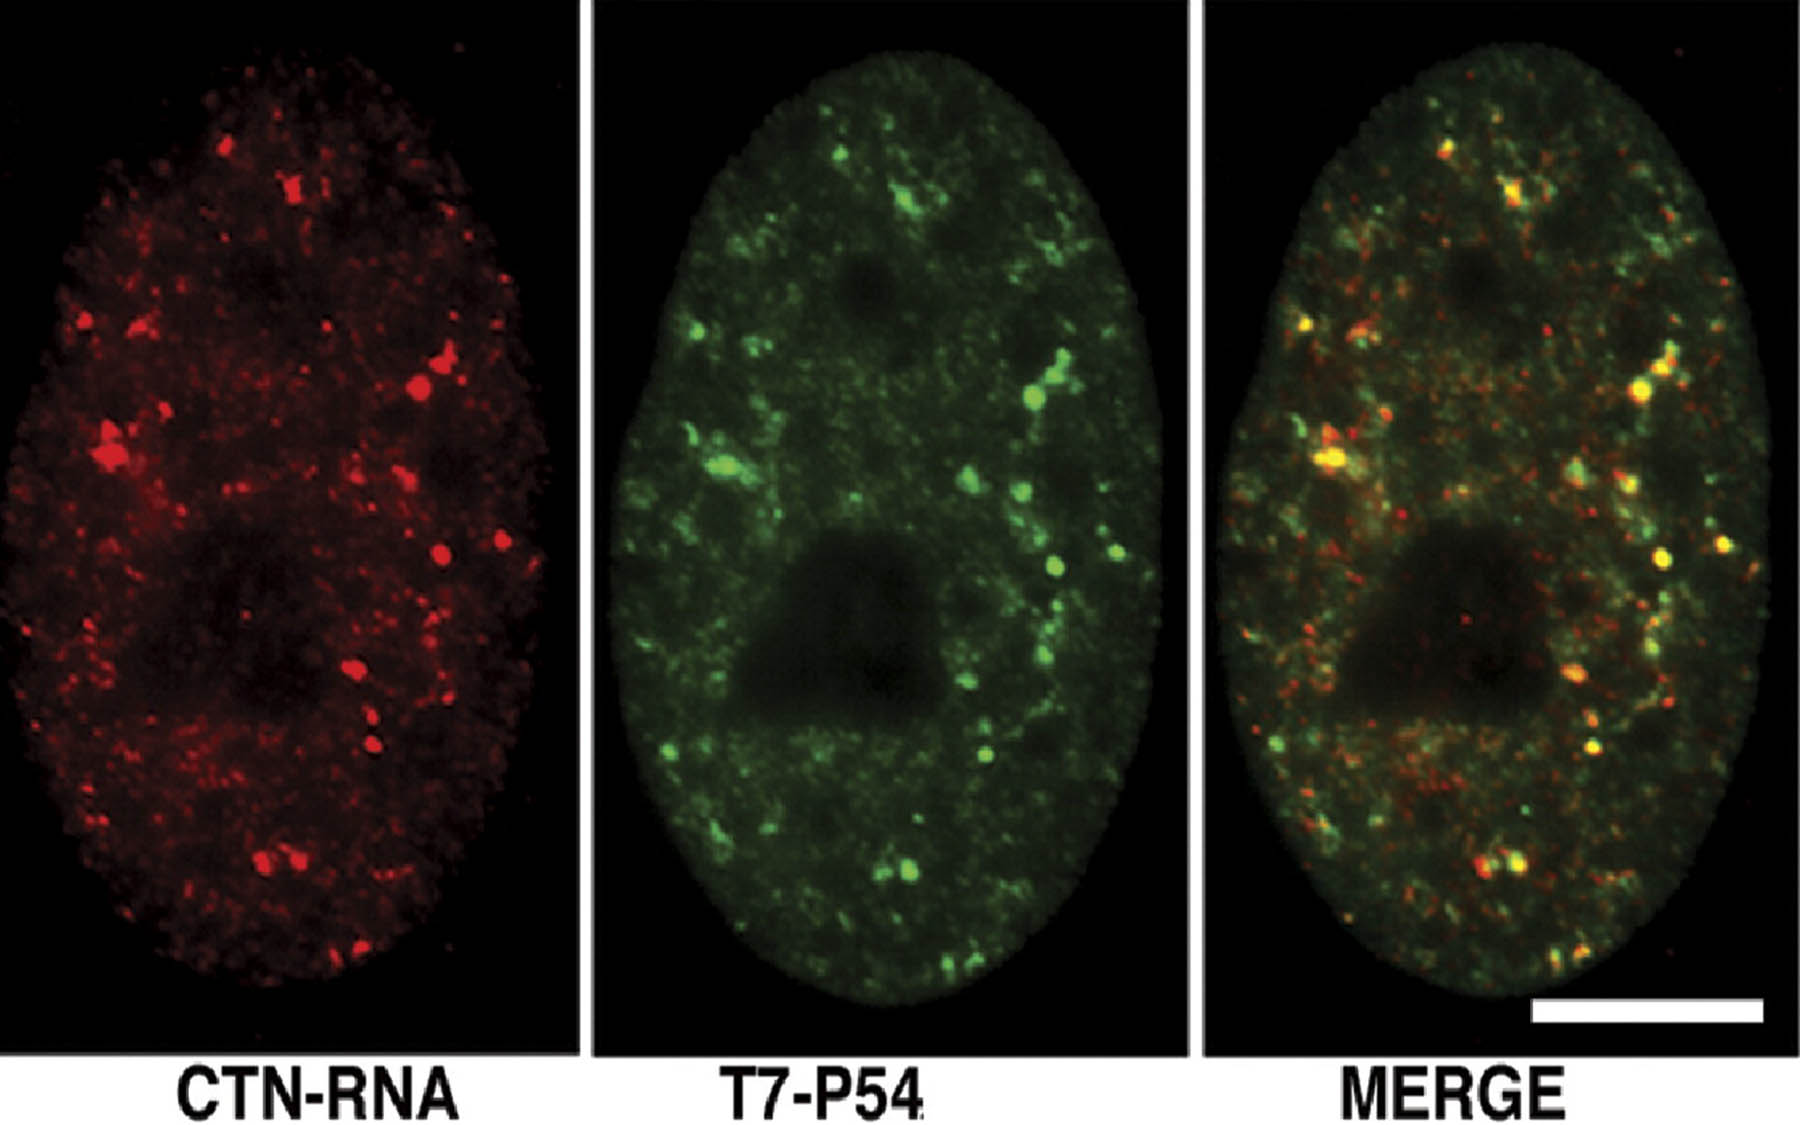 CTN-RNA paraspeckles